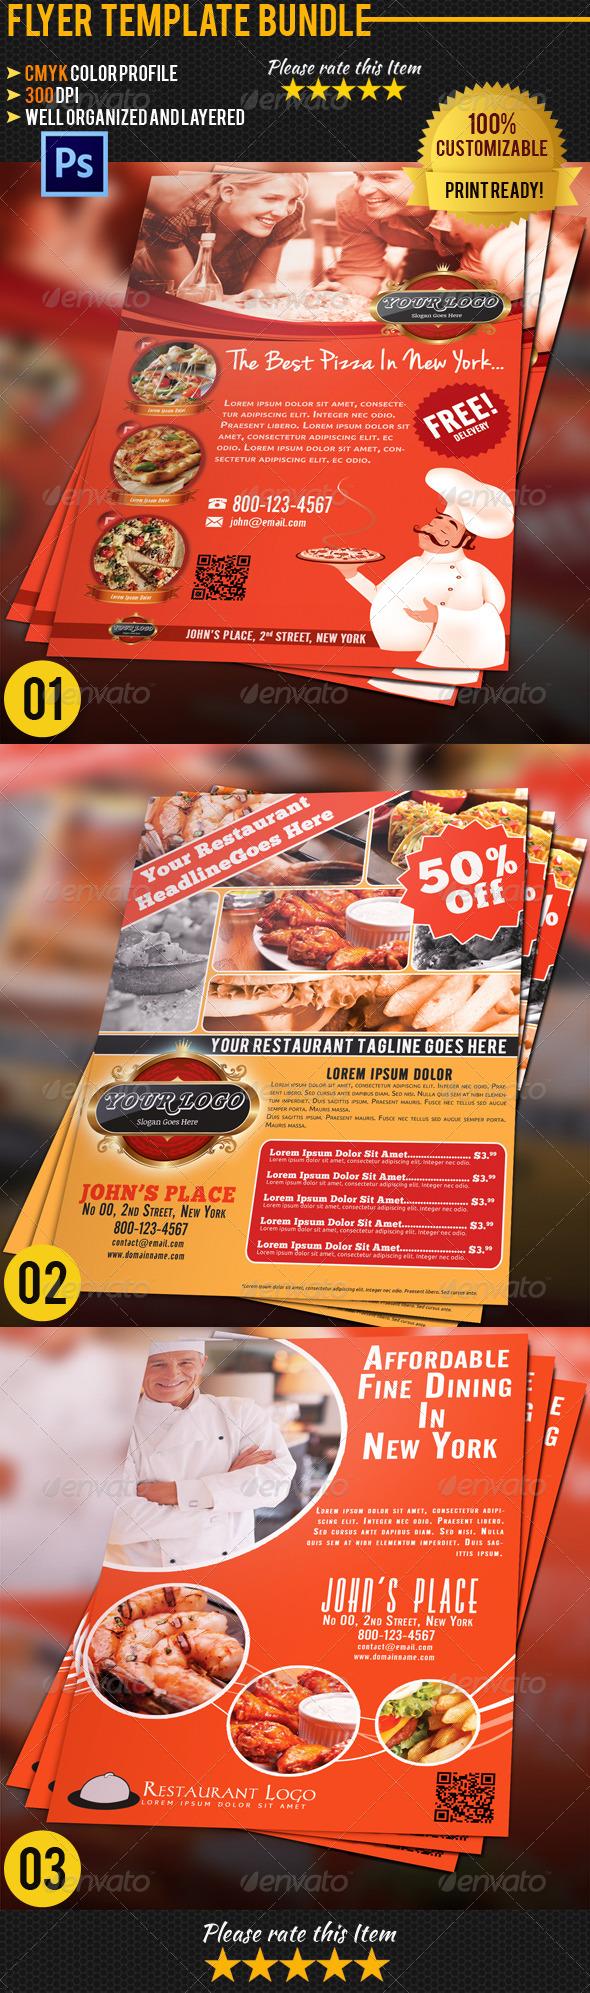 Restaurant Flyer Bundle 01 - Restaurant Flyers